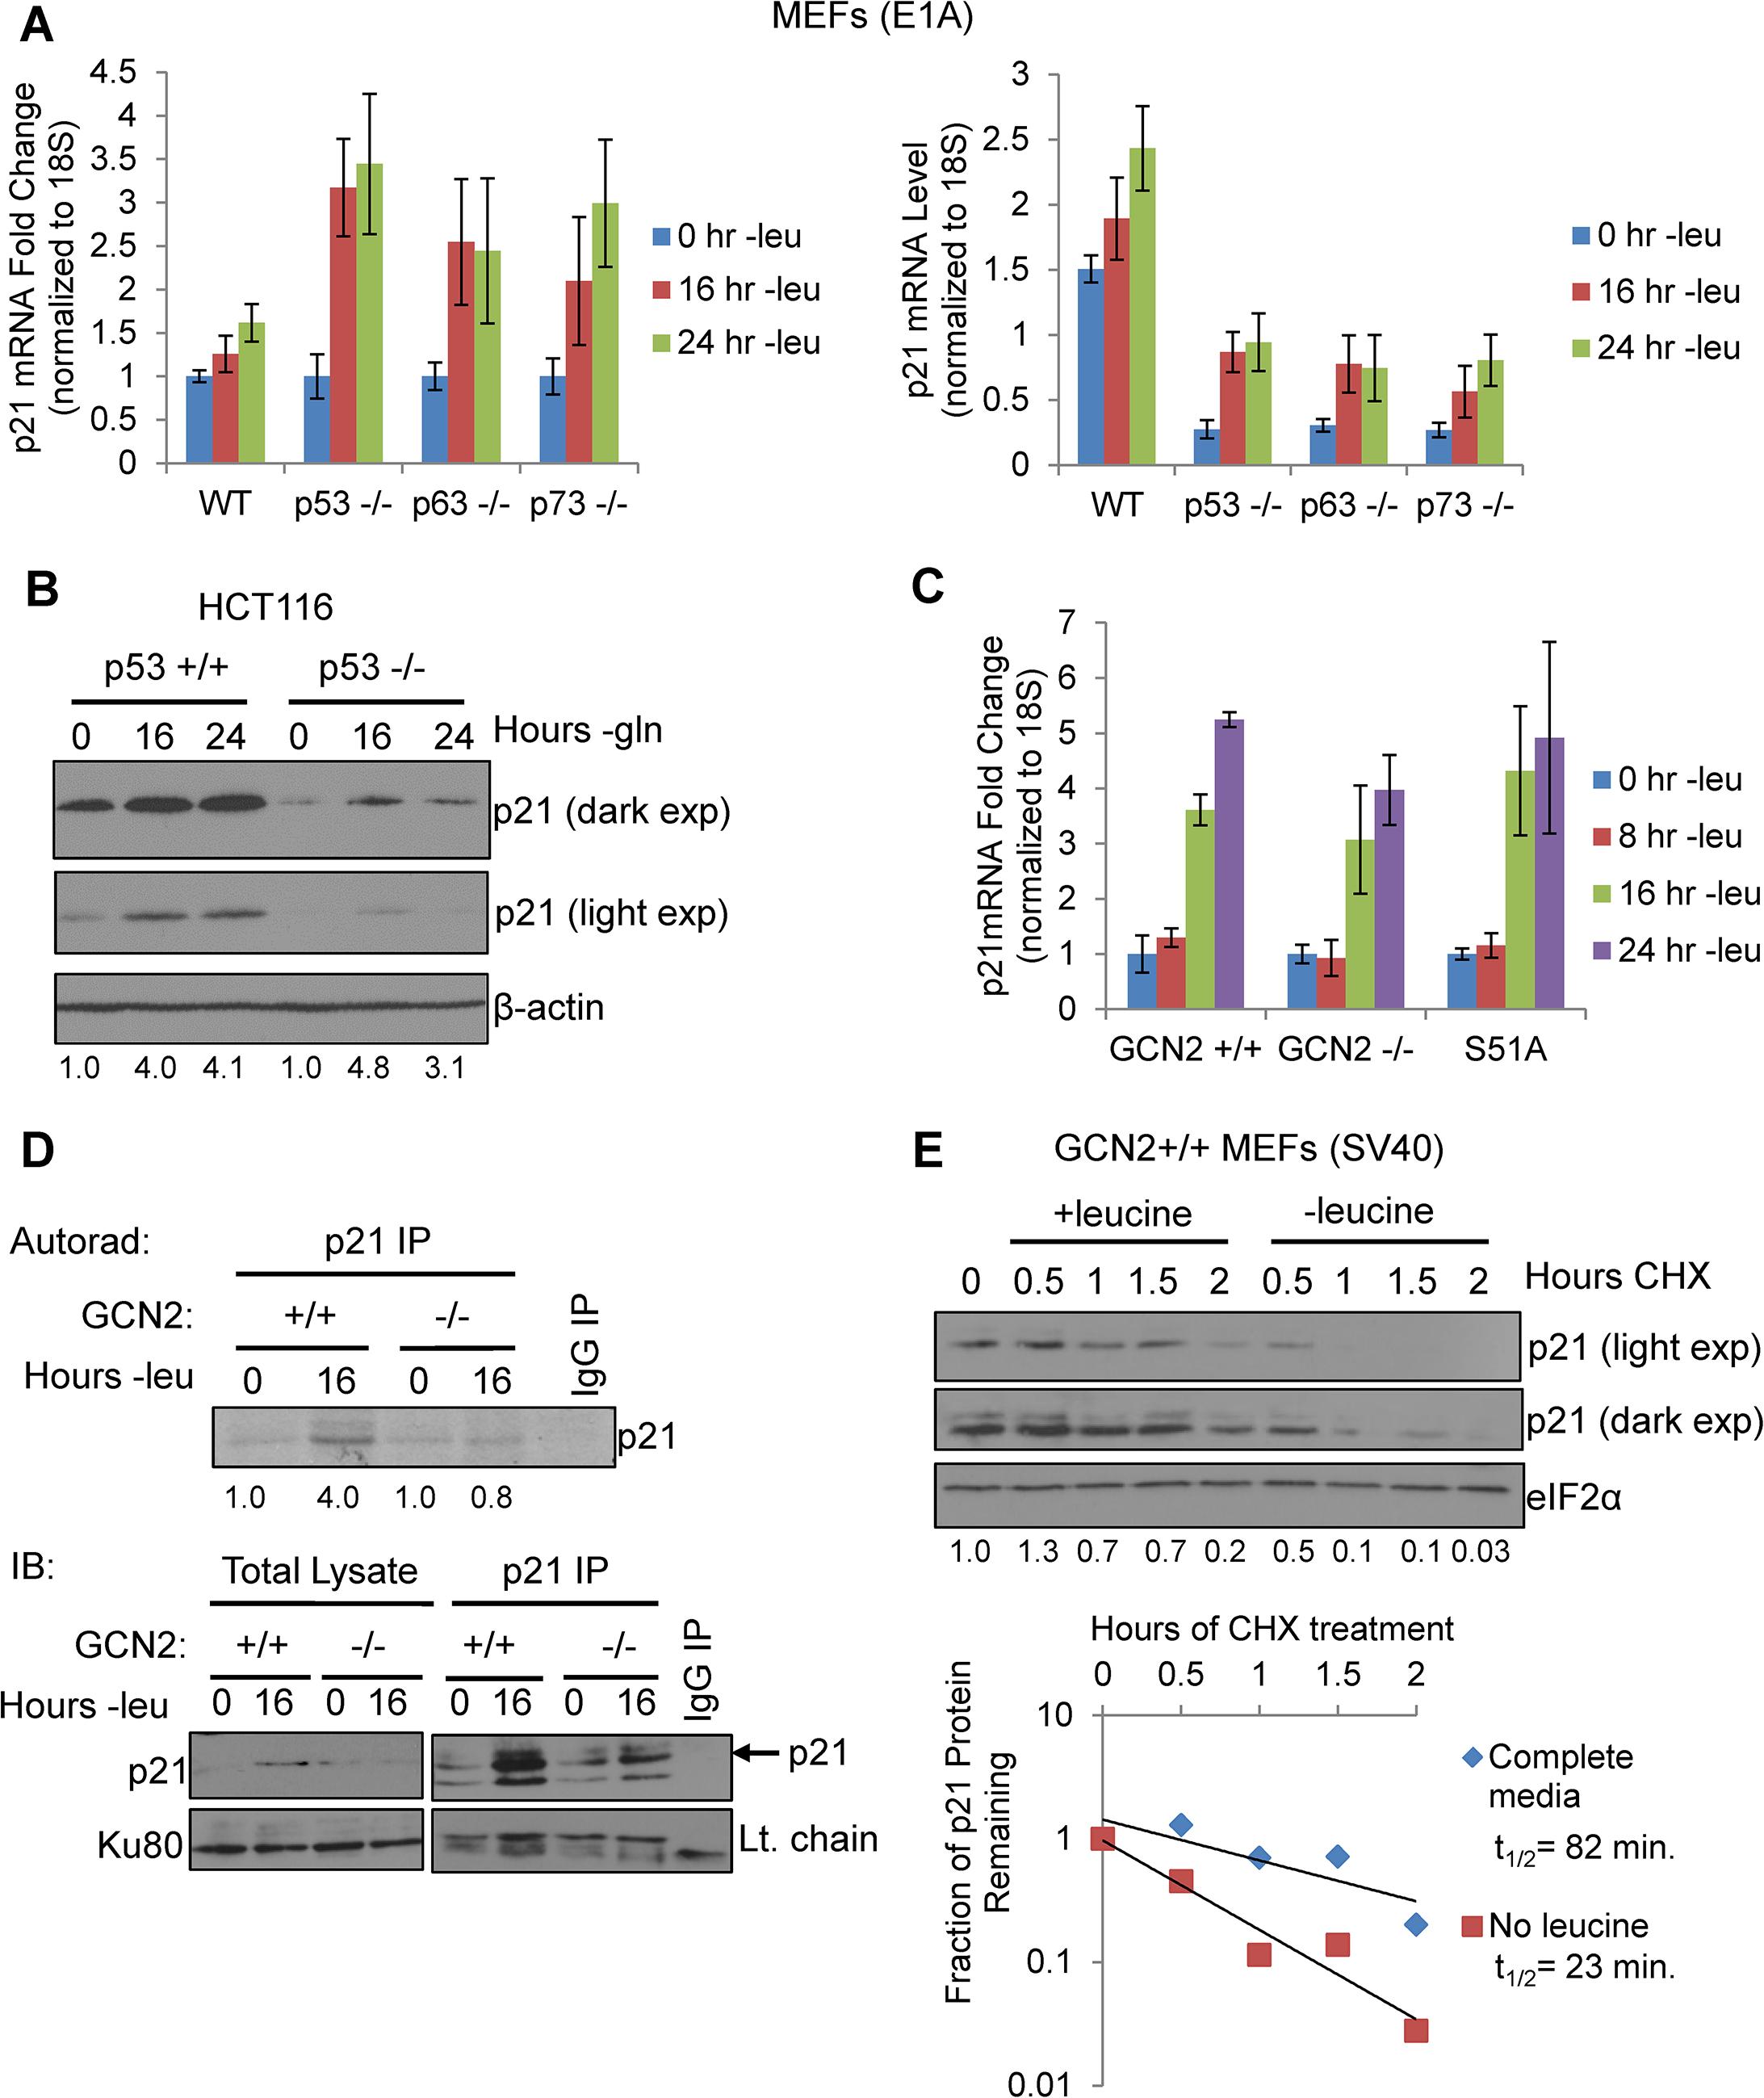 GCN2 enhances p21 translation independently of p53.